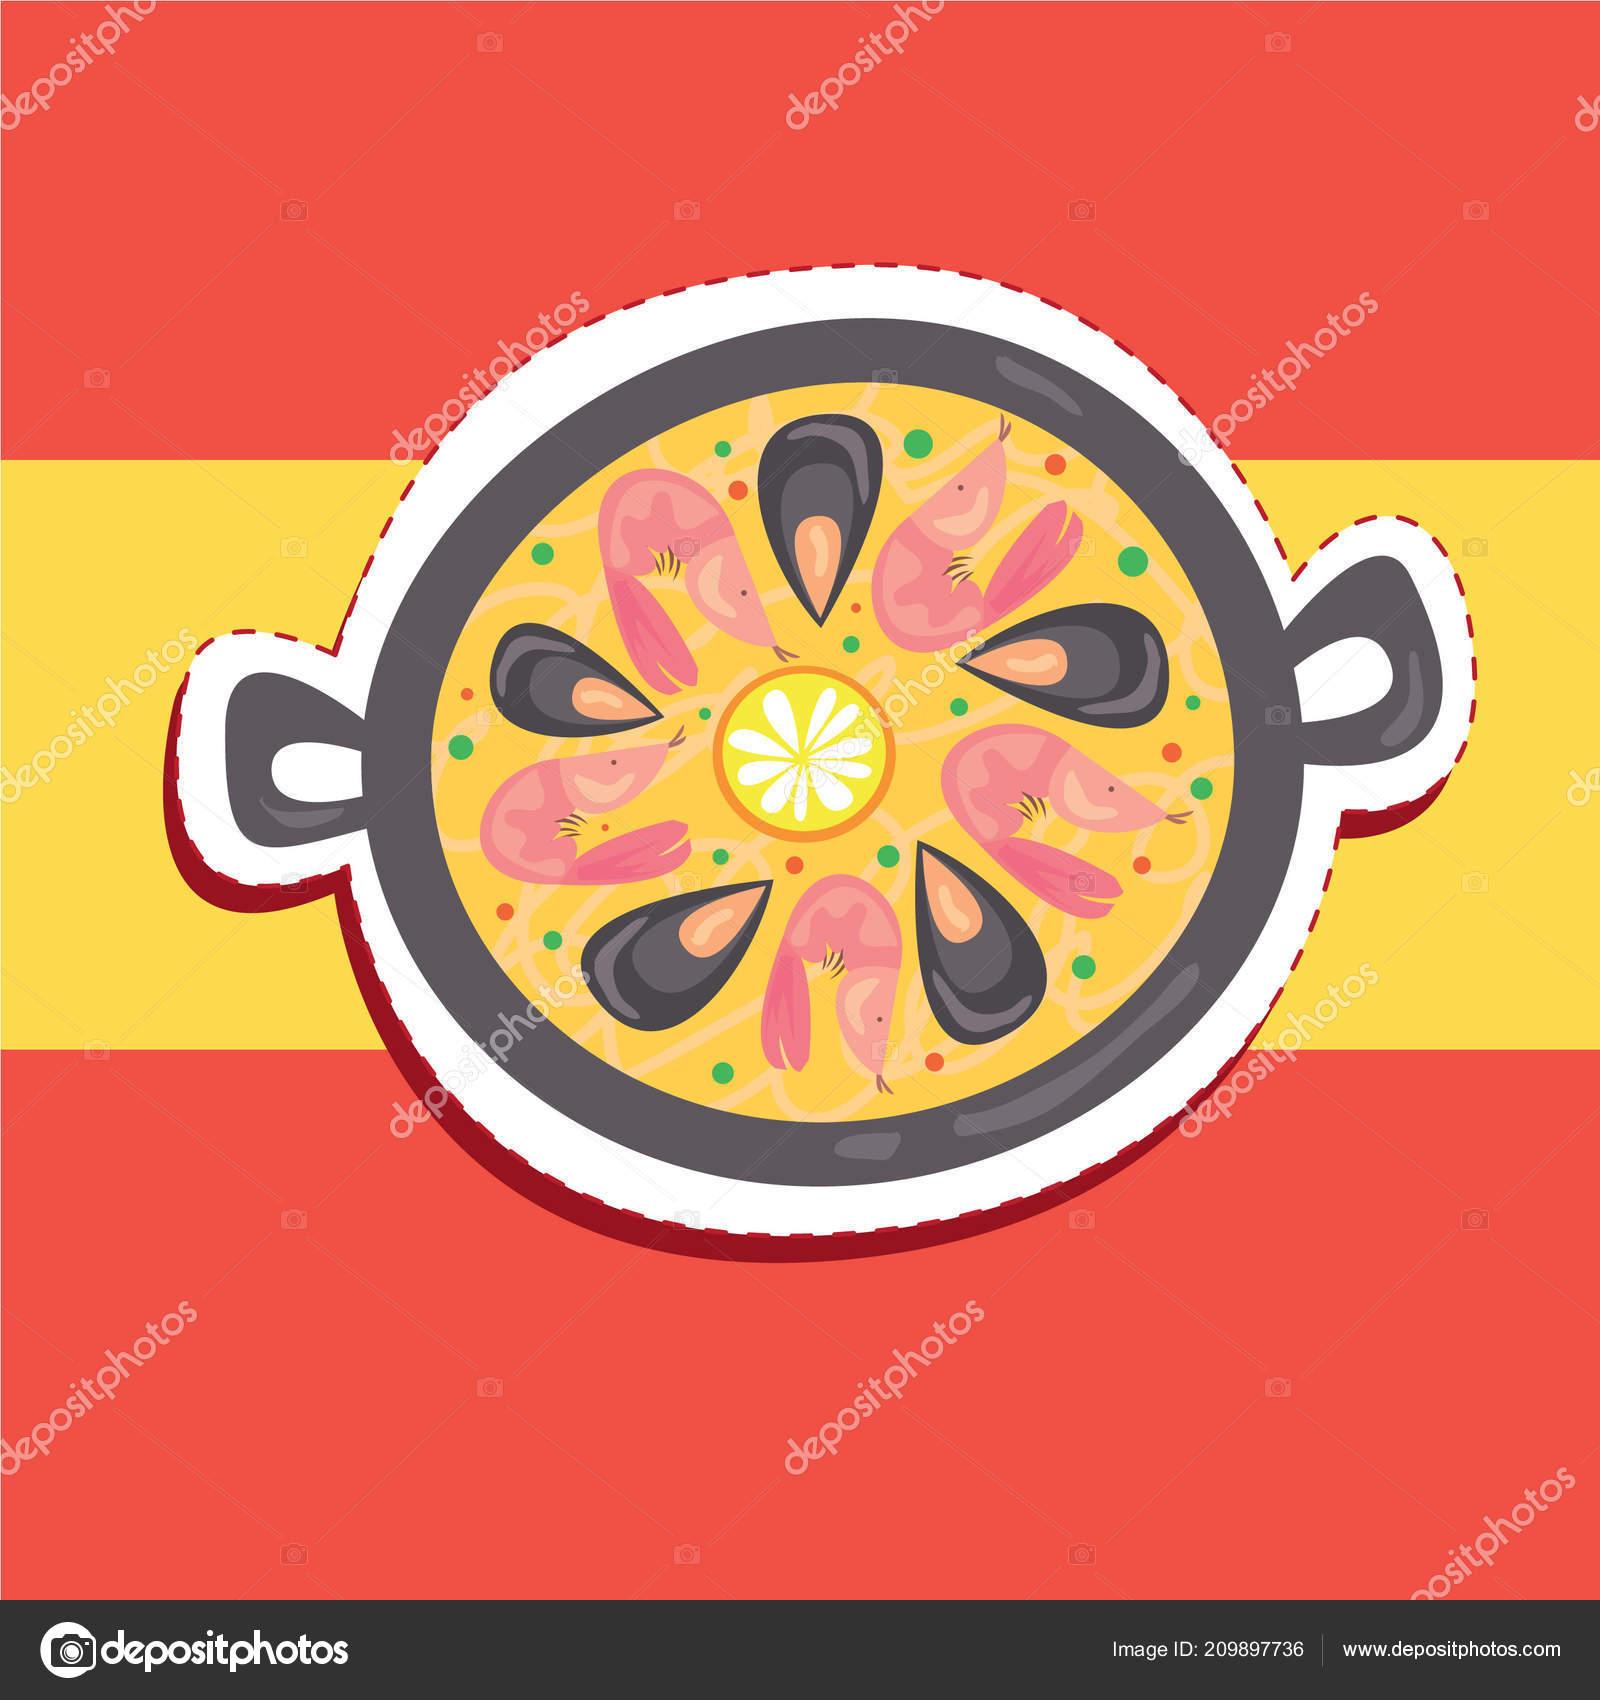 Dessin Paella plat paella espagnole mignon dessin animé avec riz fruits mer